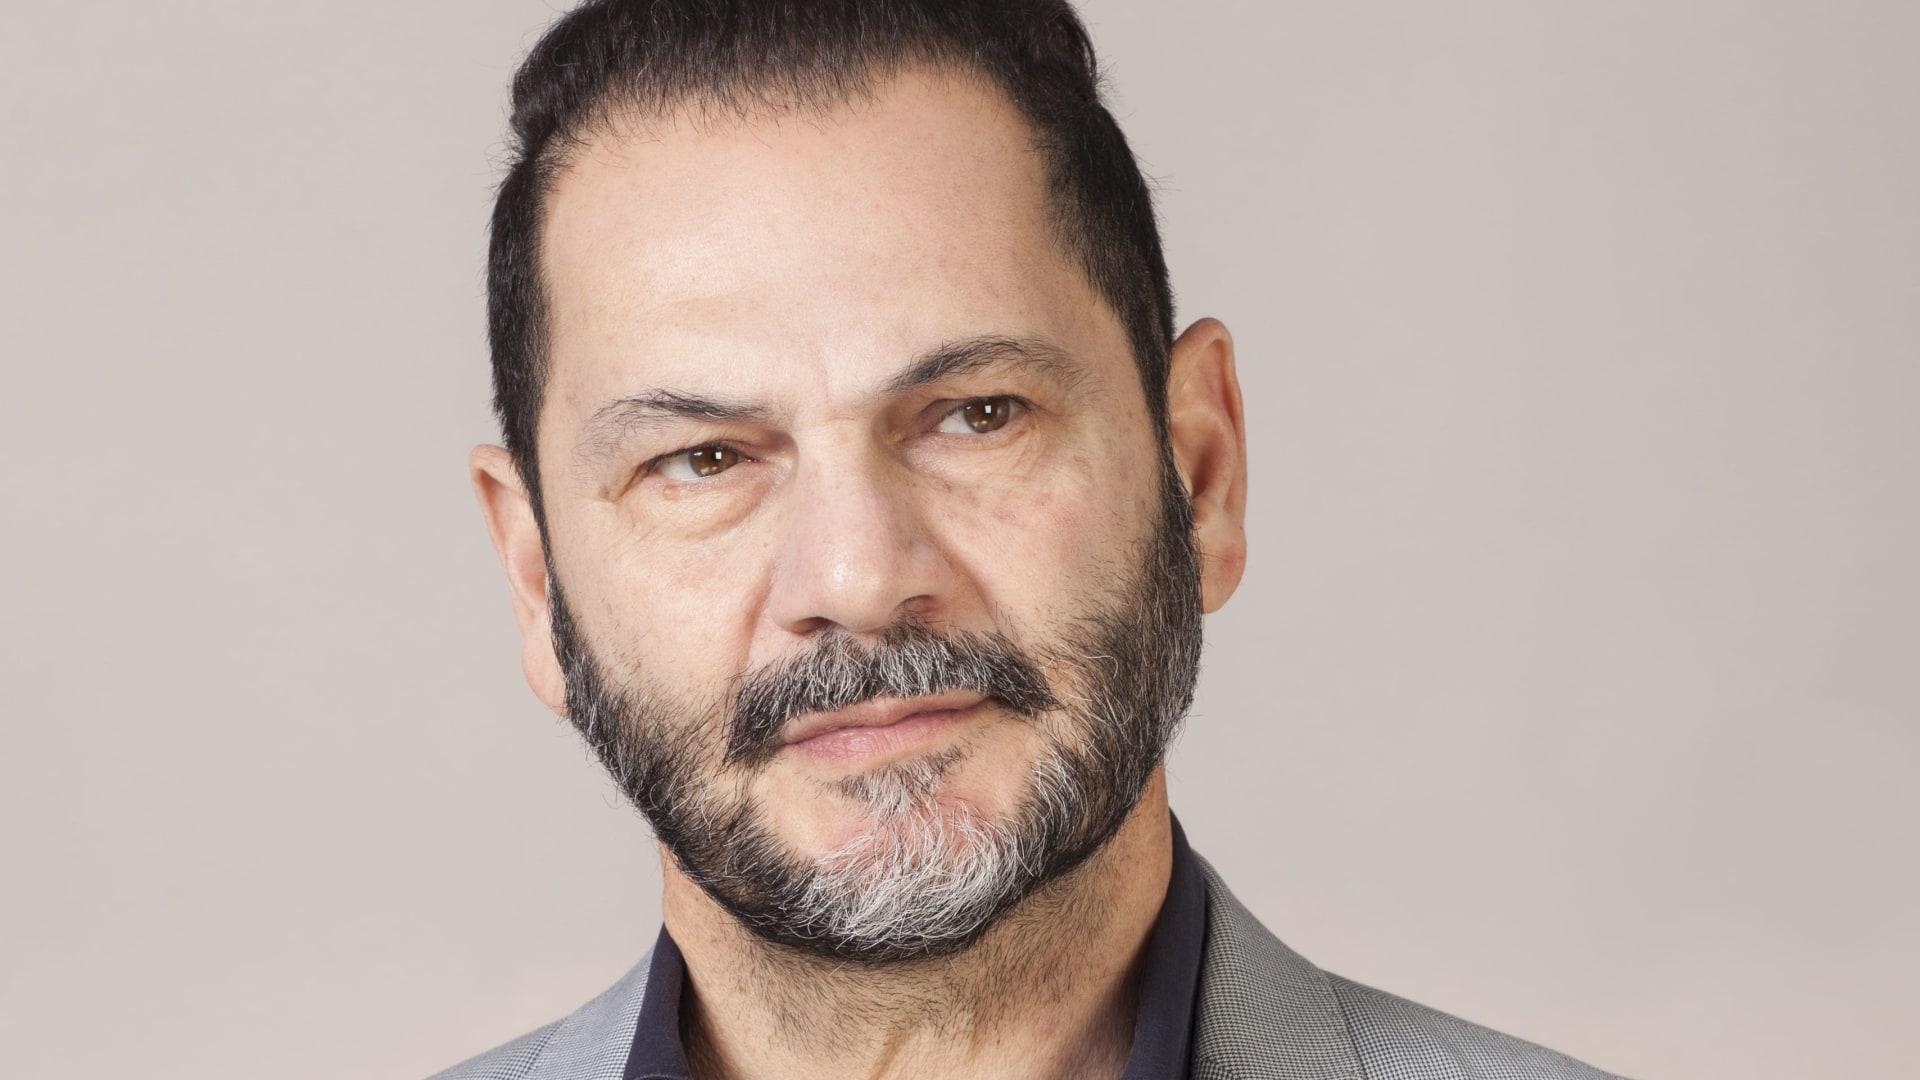 Alberto Vetroni